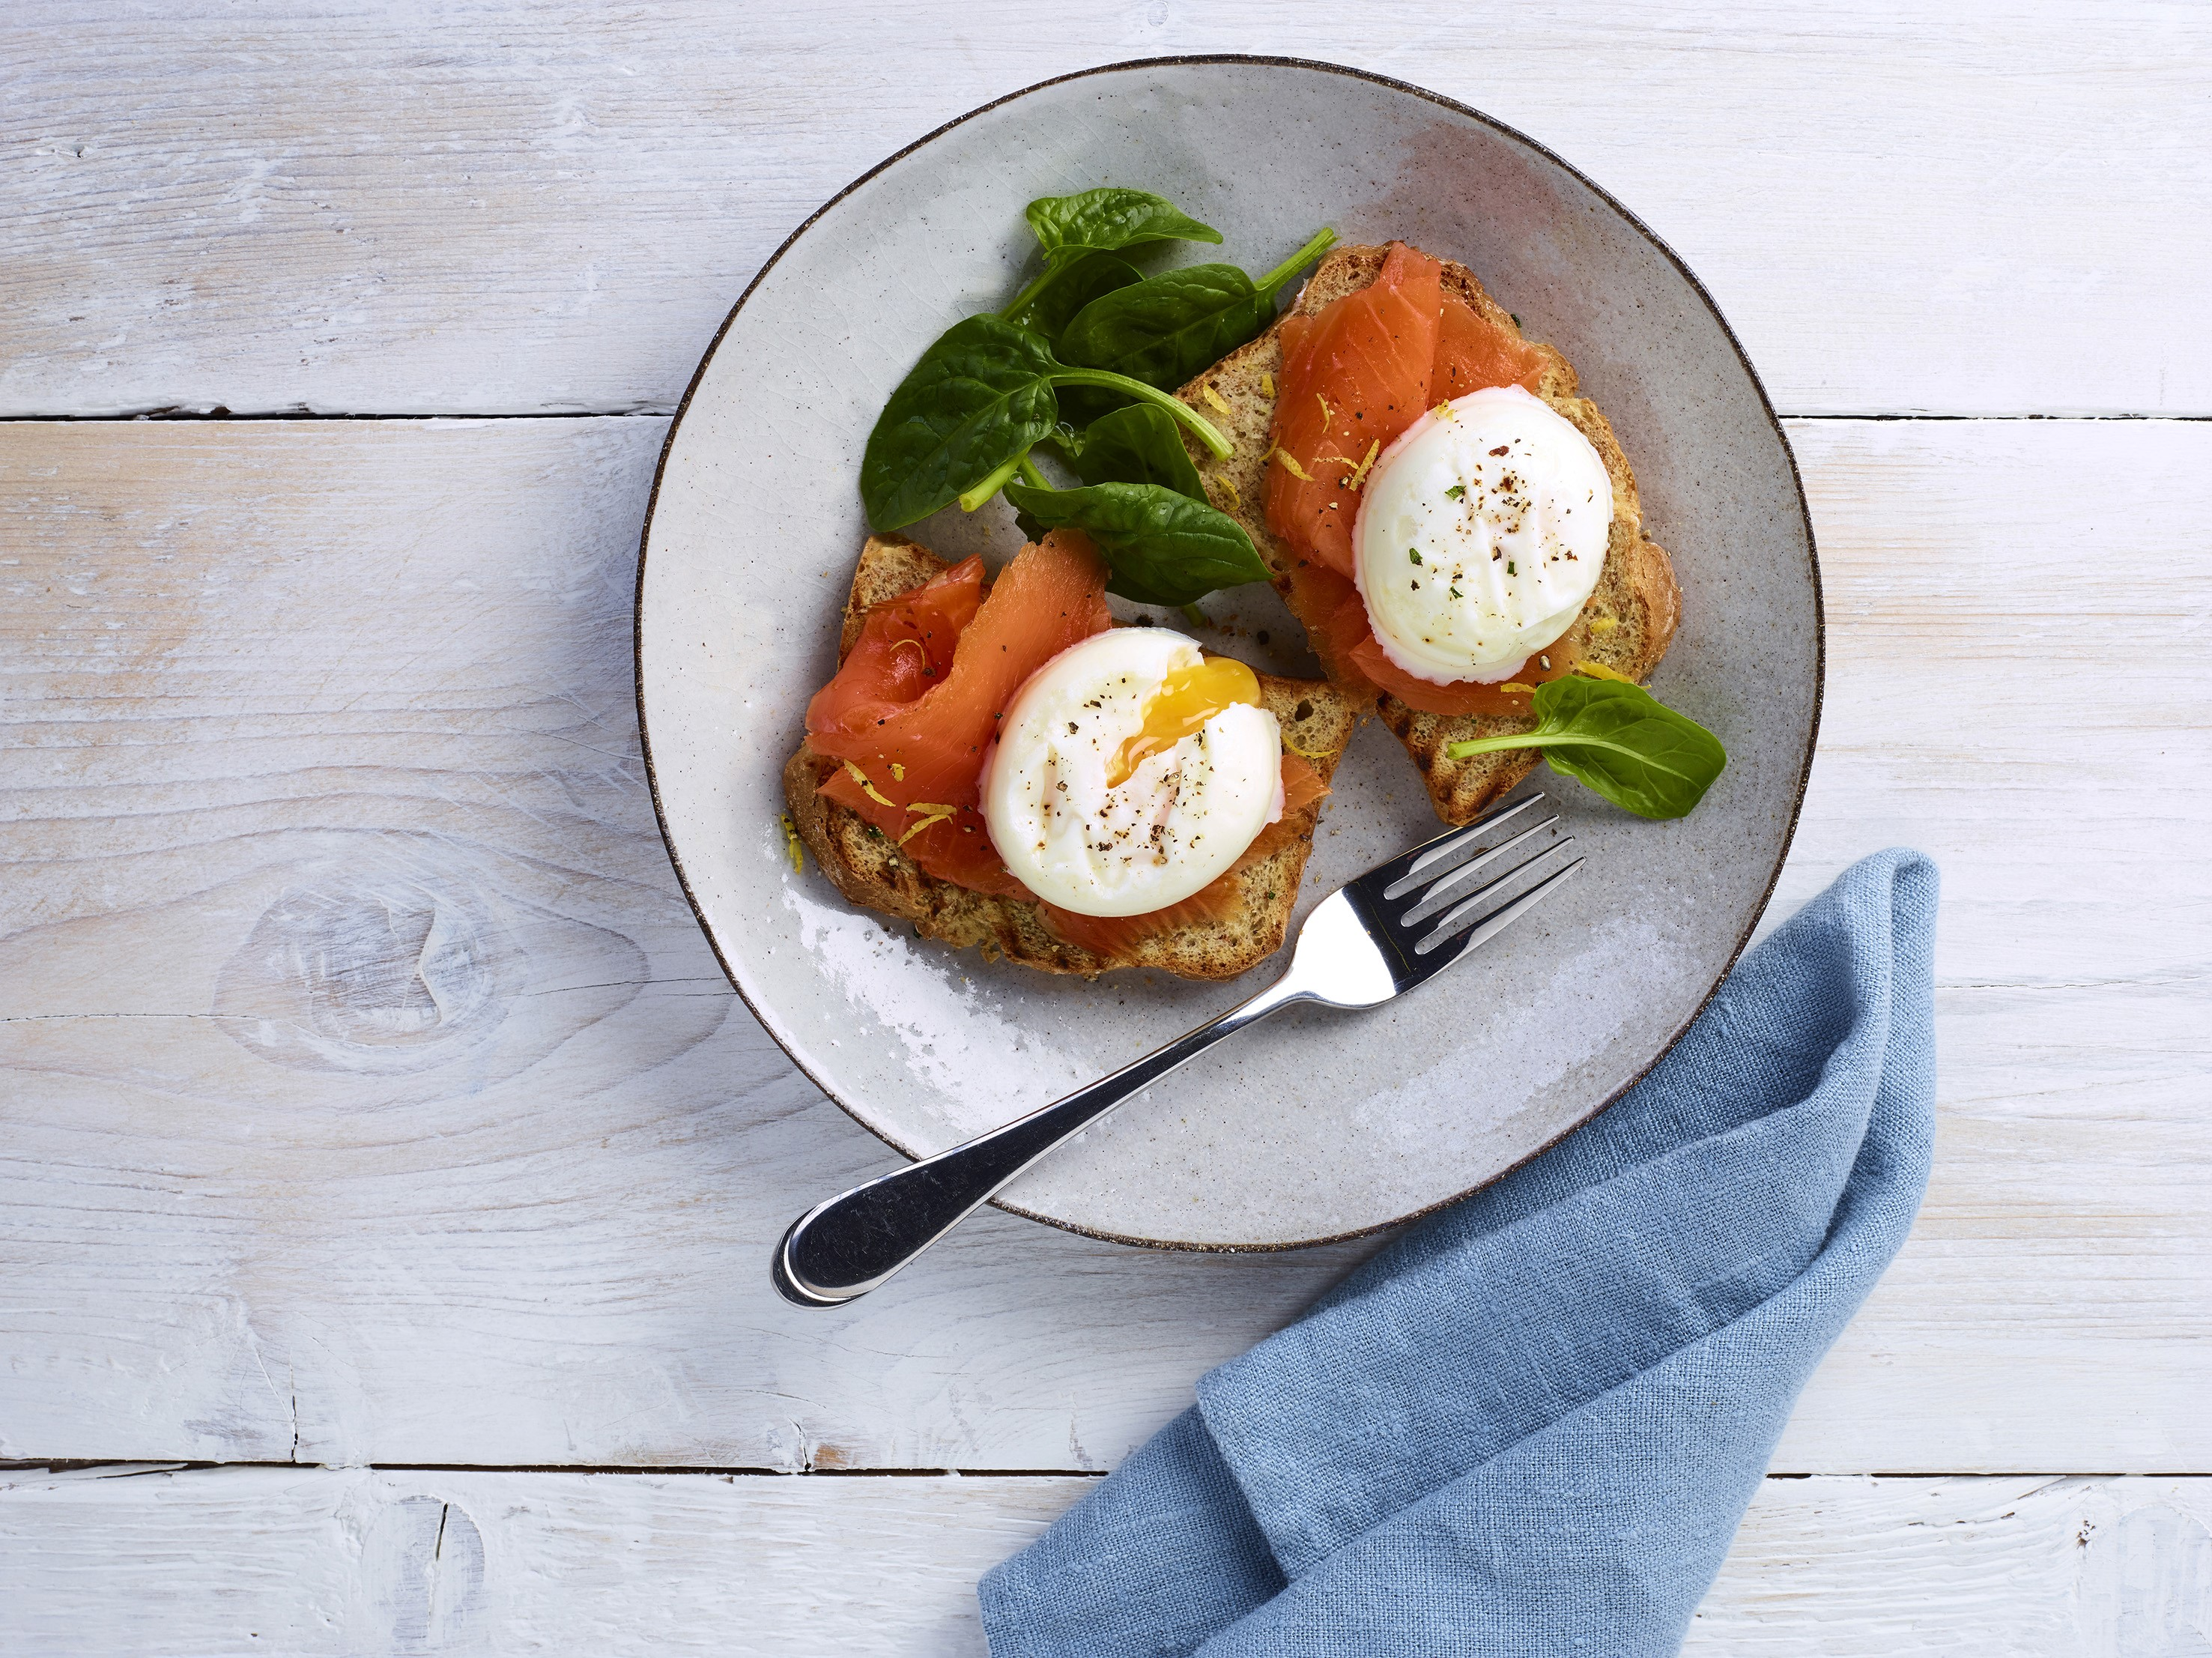 Brakes' British Lion Quality Free Range Poached Eggs